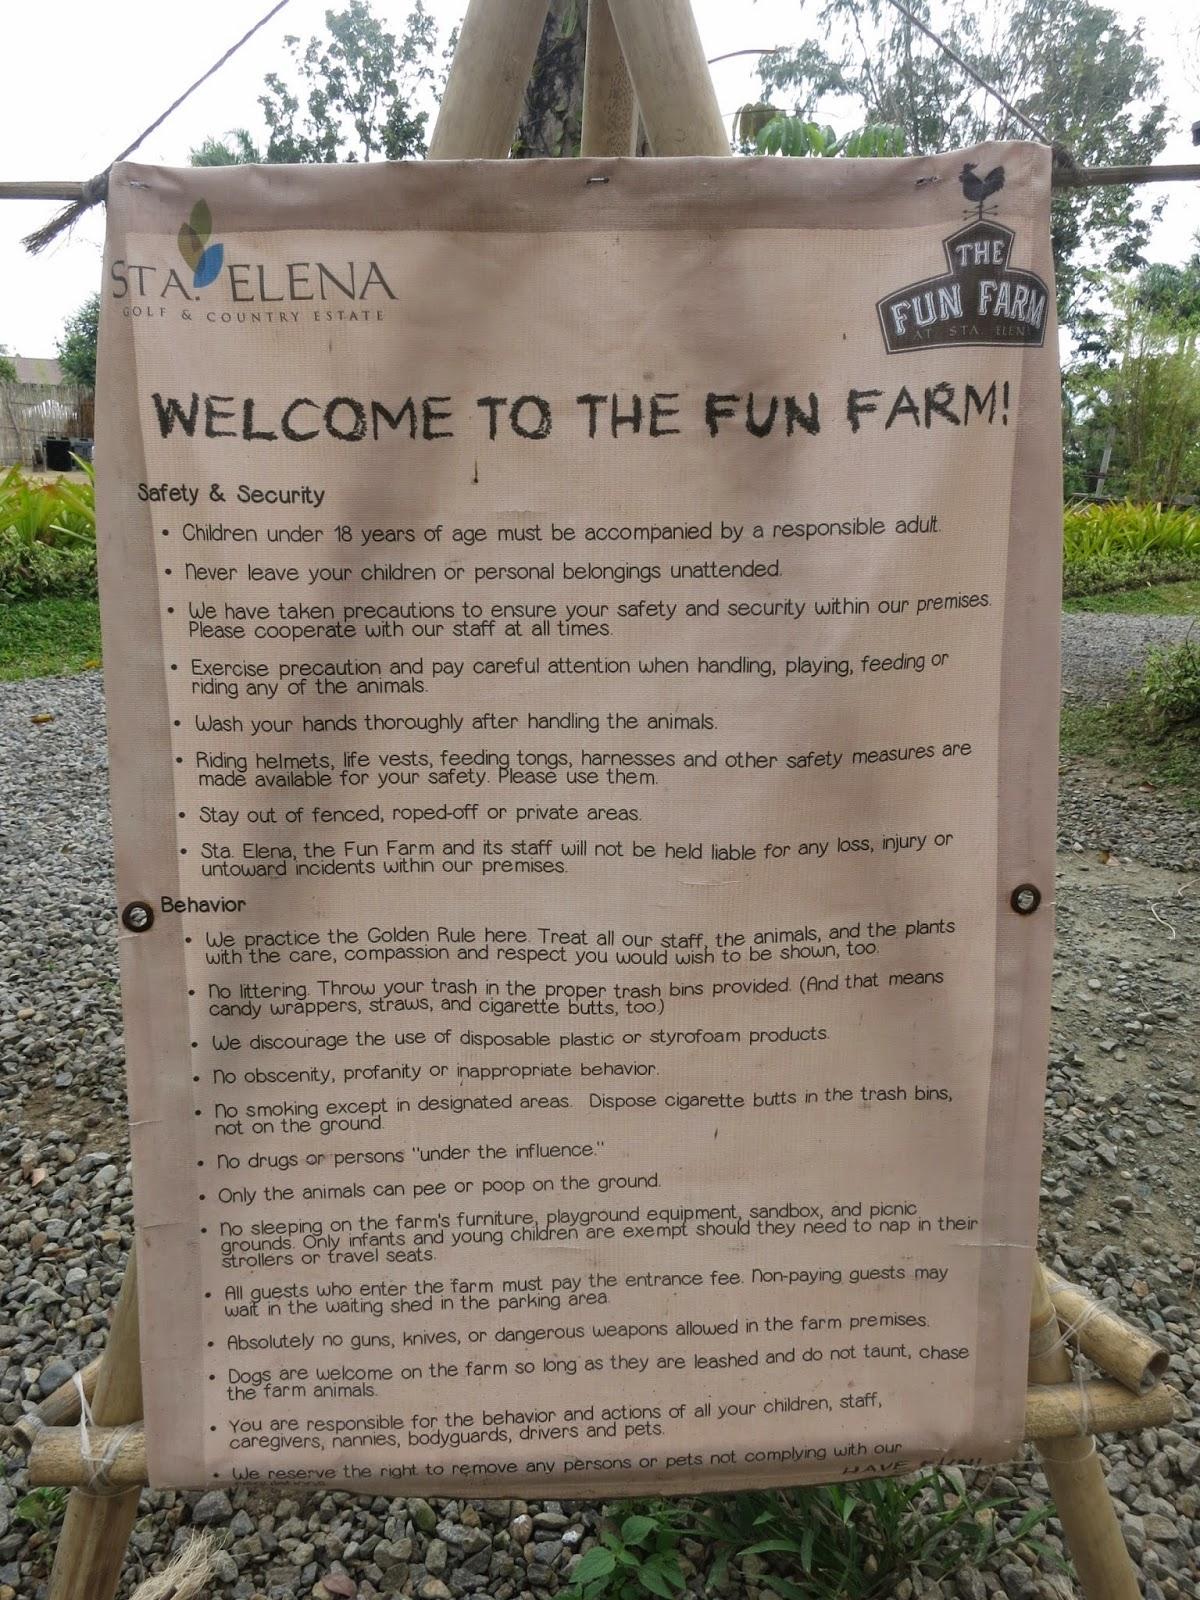 Sta Elena Fun Farm Safety & Security